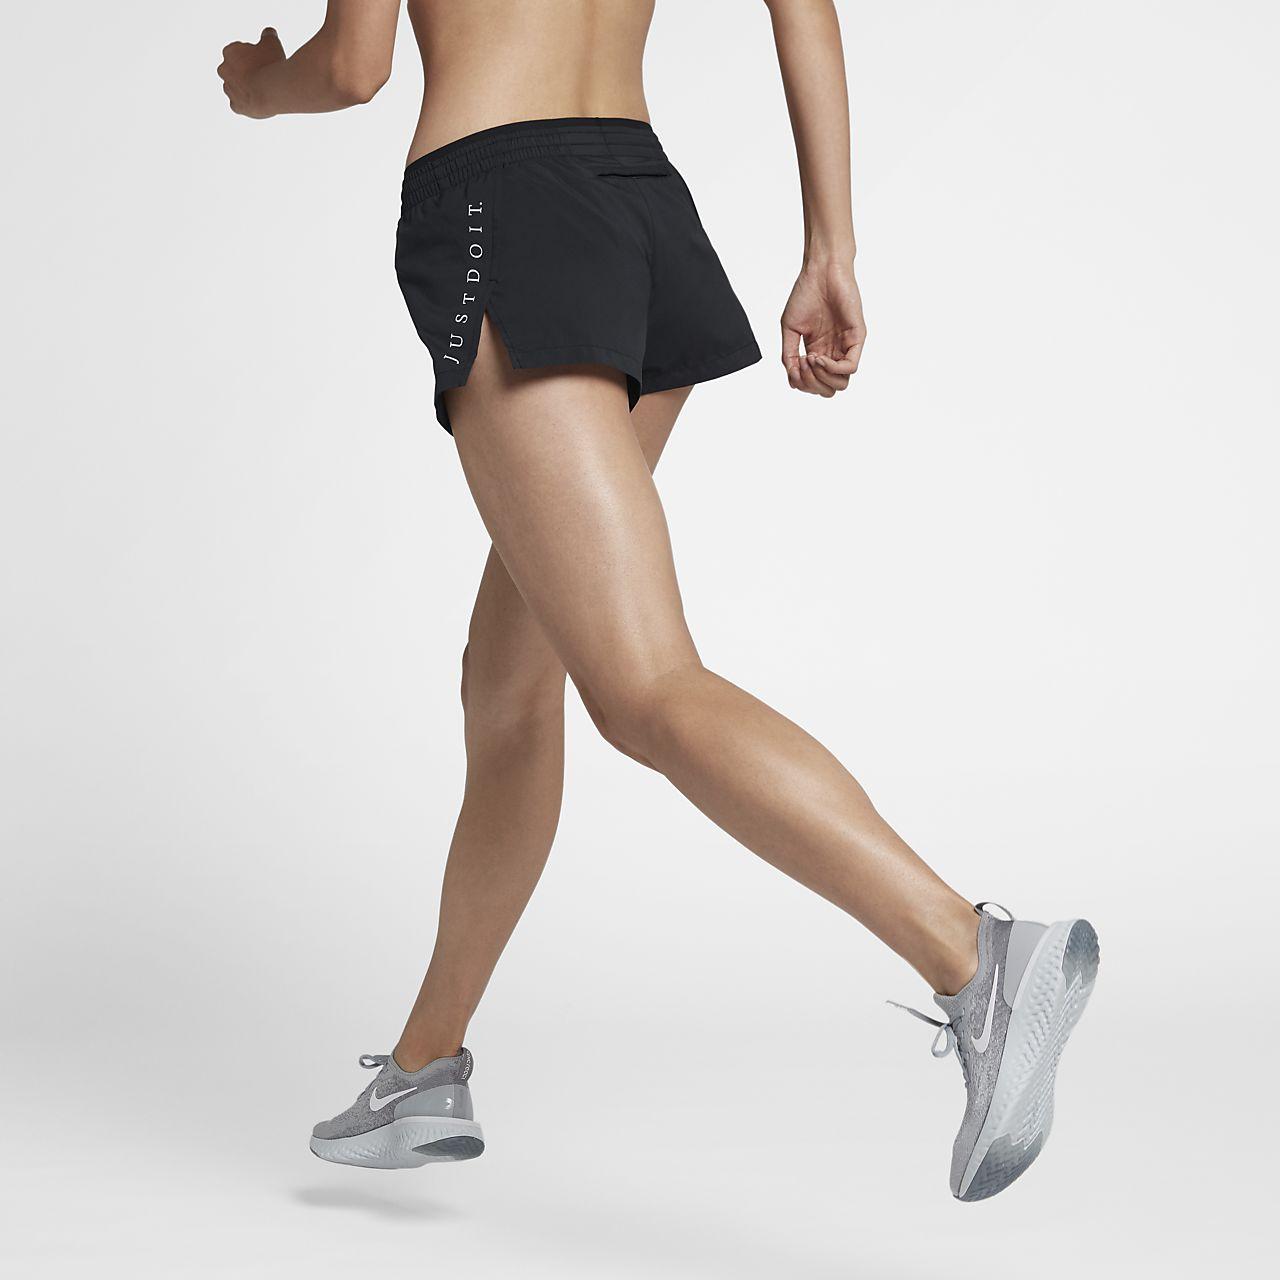 79e1674853 Nike Elevate Women's Running Shorts